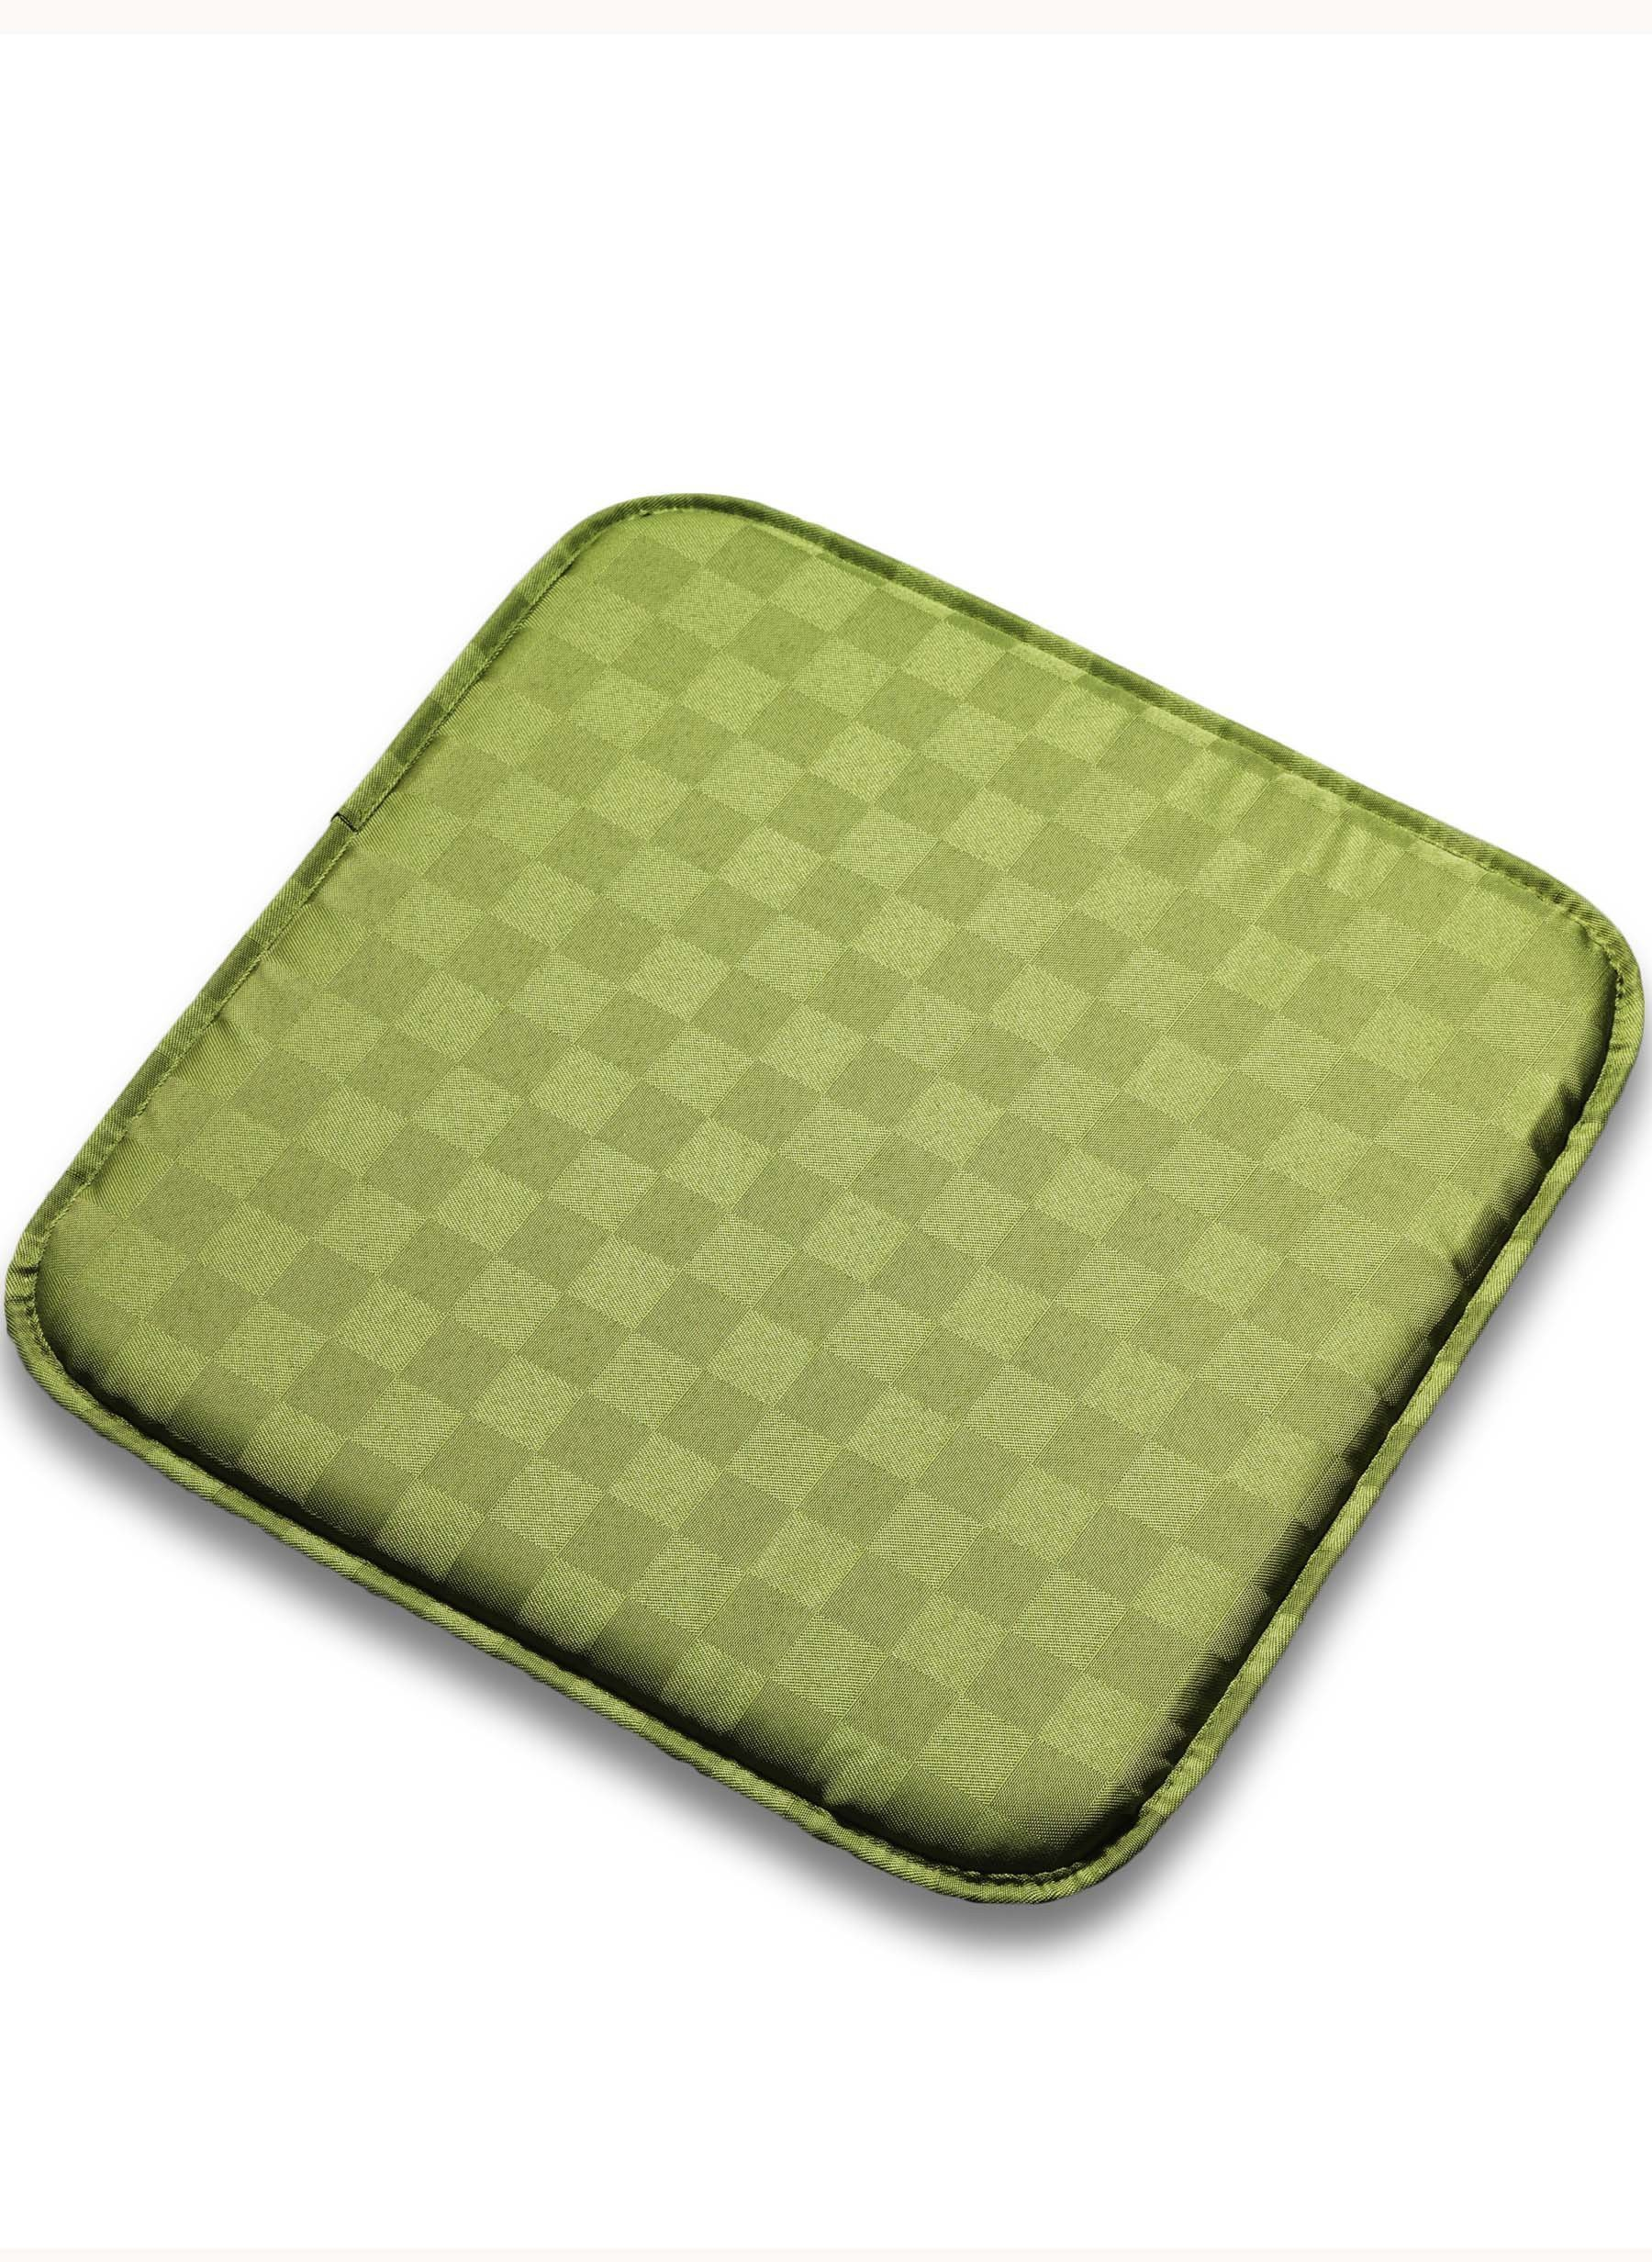 "Couss.chaise""Picassso""2pc.vert"